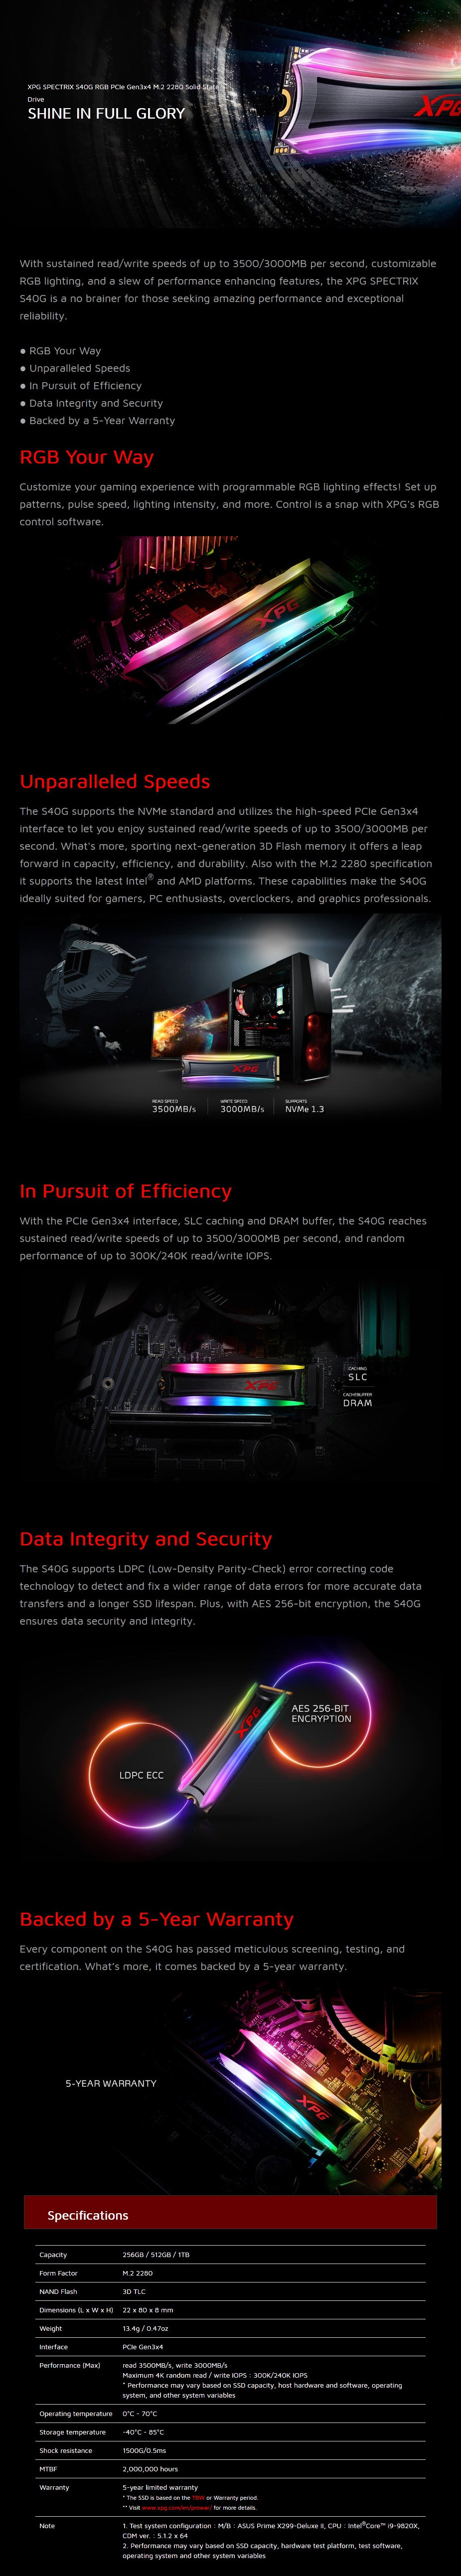 ADATA XPG Spectrix S40G 1TB RGB M.2 NVMe SSD AS40G-1TT-C - Overview 1